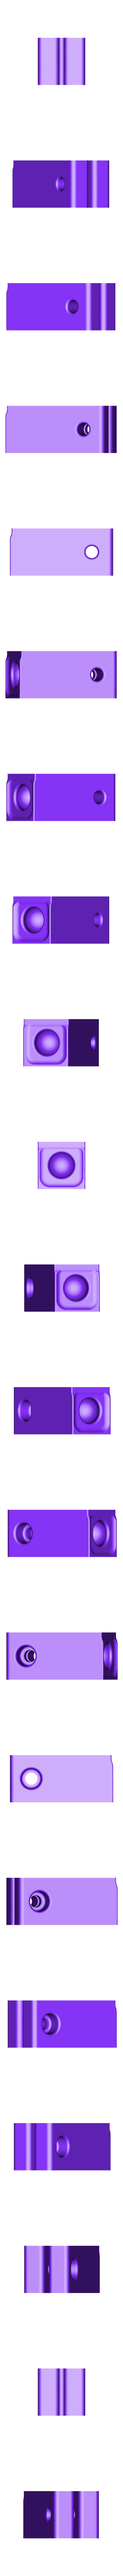 PCB_FRESNEL_HOLDER.stl Download free STL file PCB Clamp v1.0 • 3D printer template, MuSSy